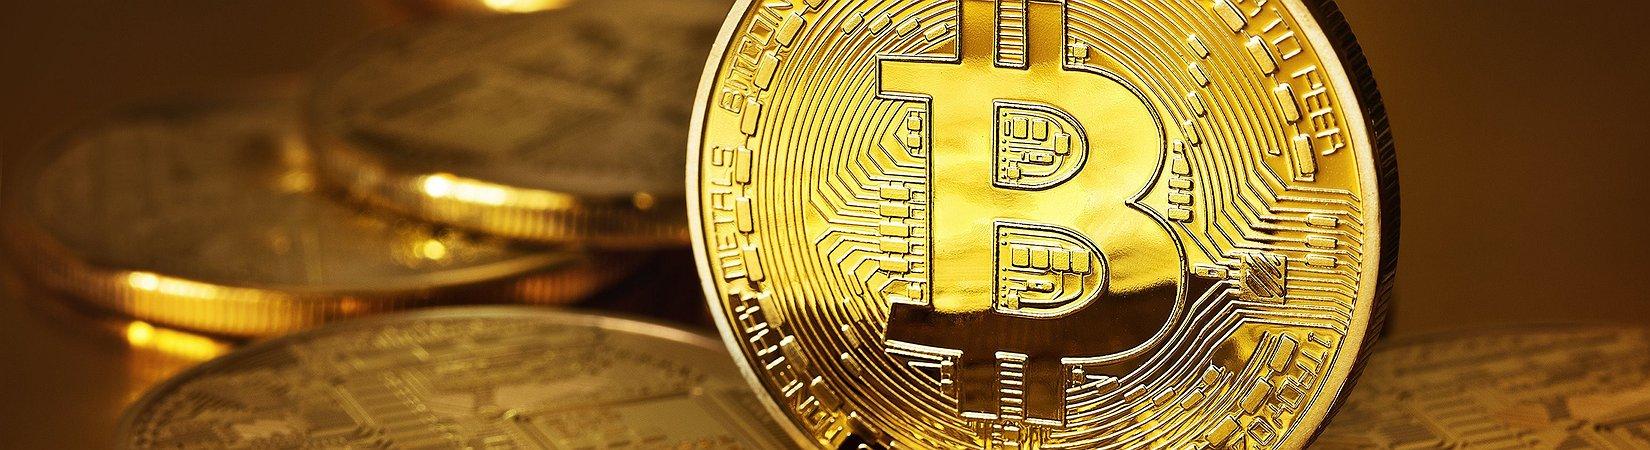 Bitcoin Slides as South Korea Considers Trading Ban